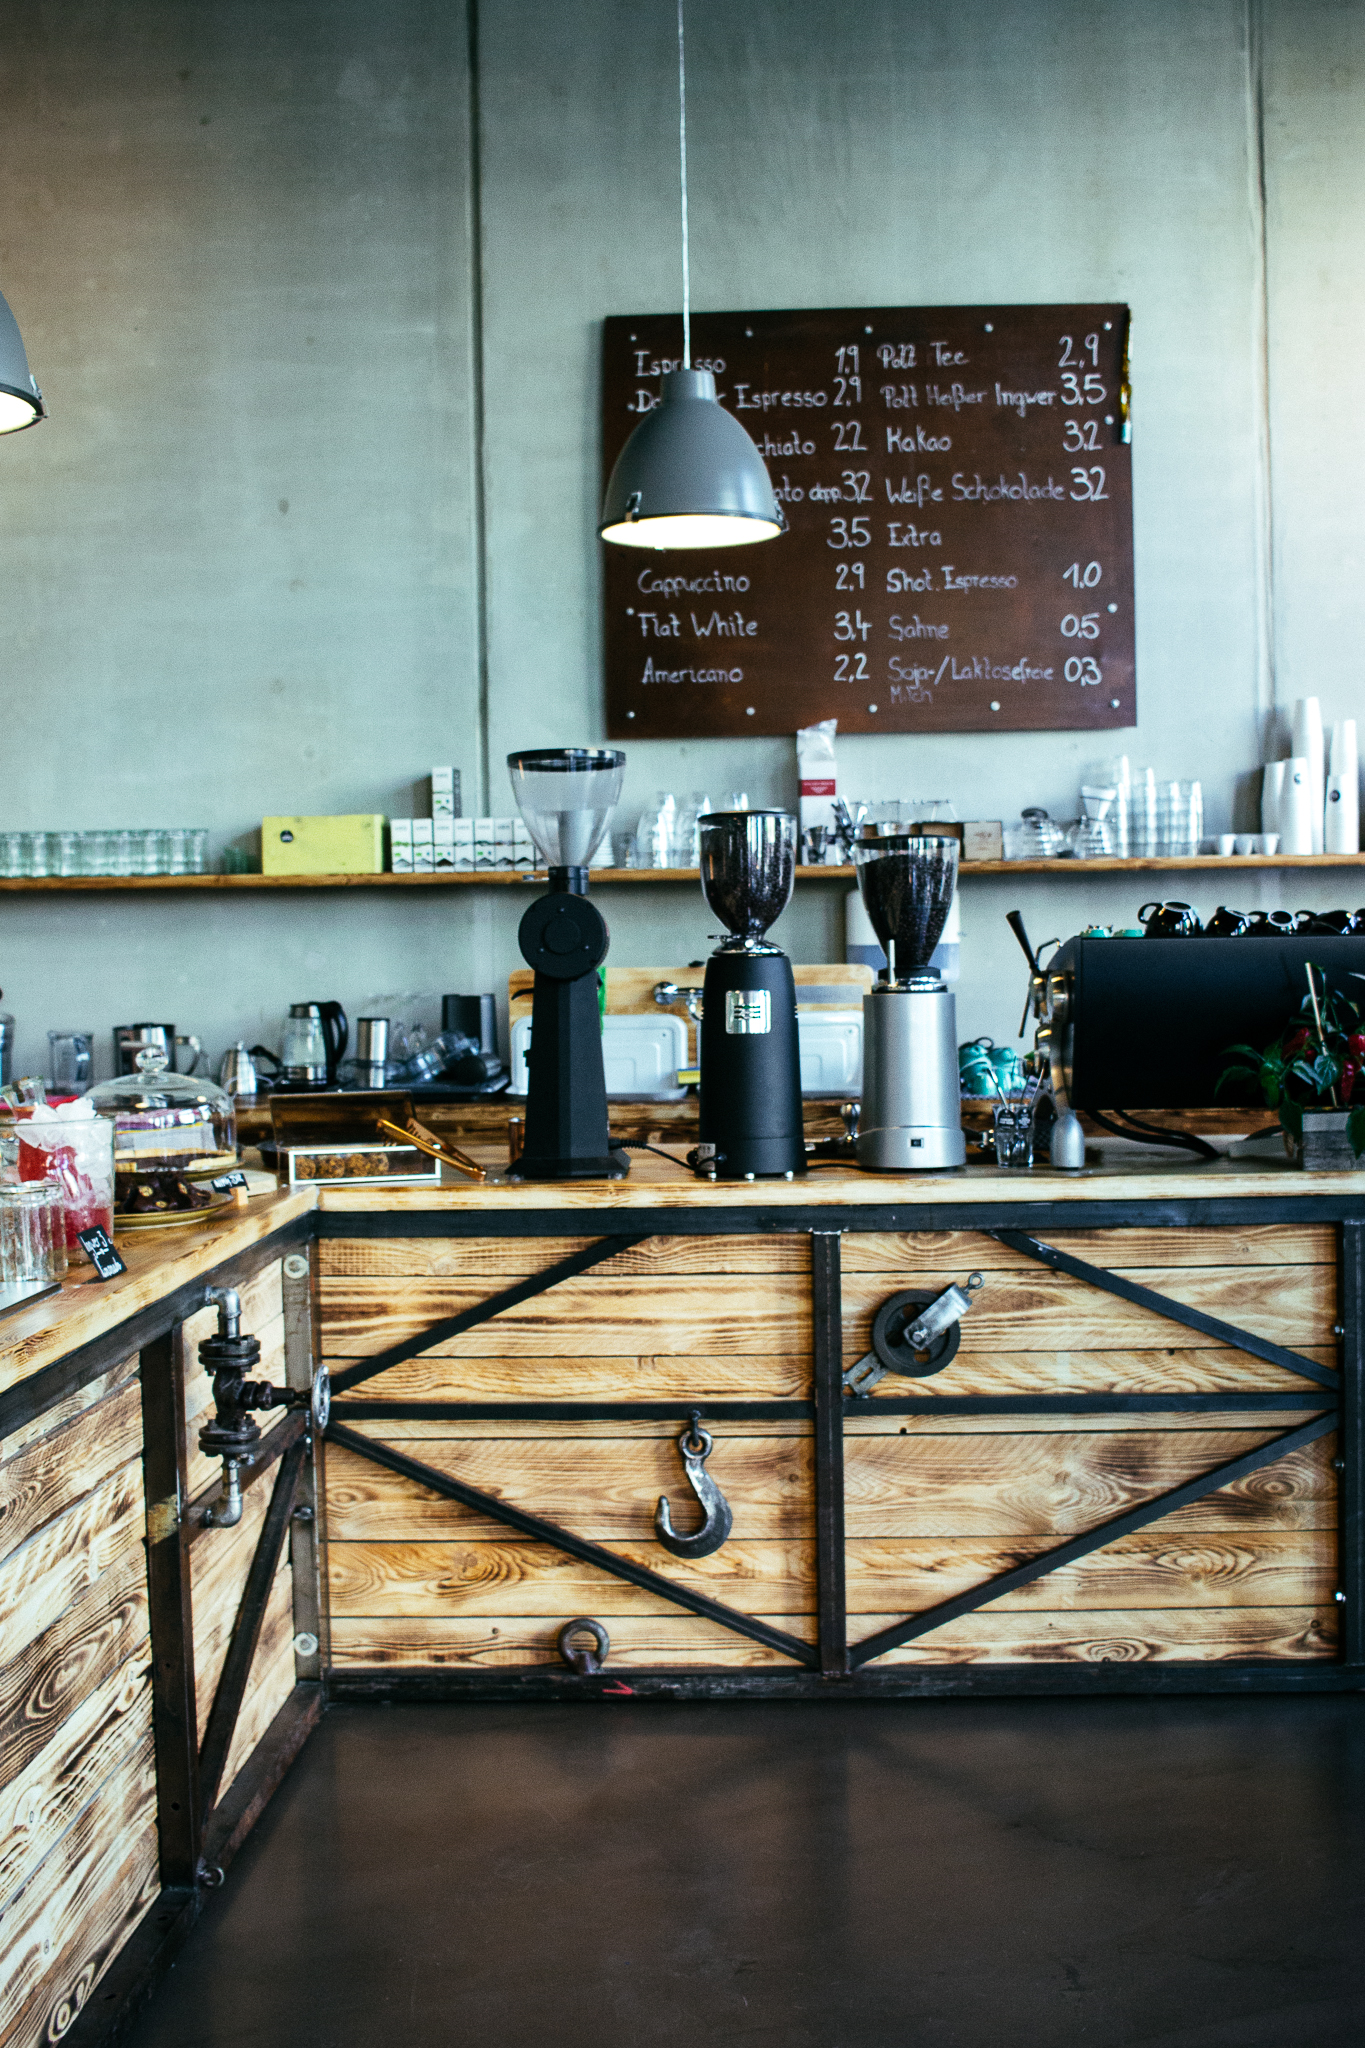 _MG_4525franz morish_kaffeehaus